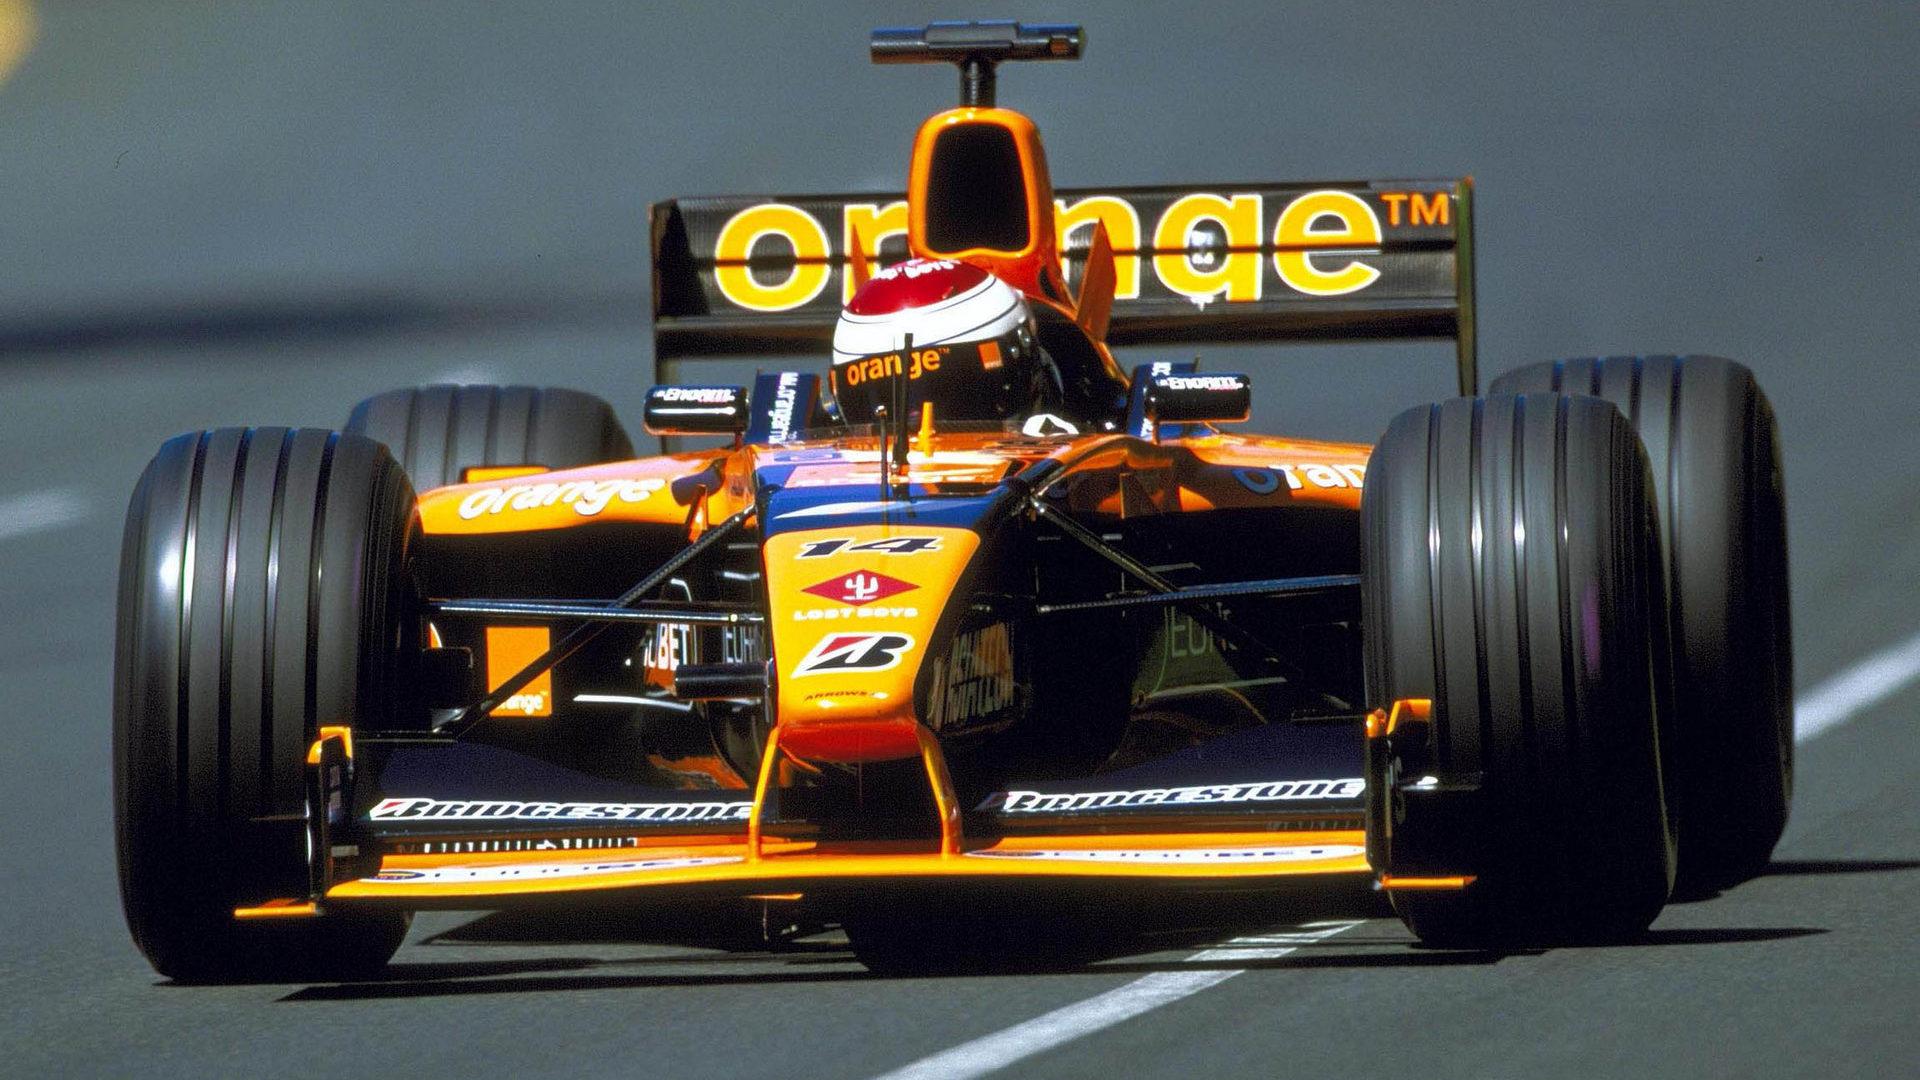 HD Wallpapers 2001 Formula 1 Grand Prix Of Australia F1